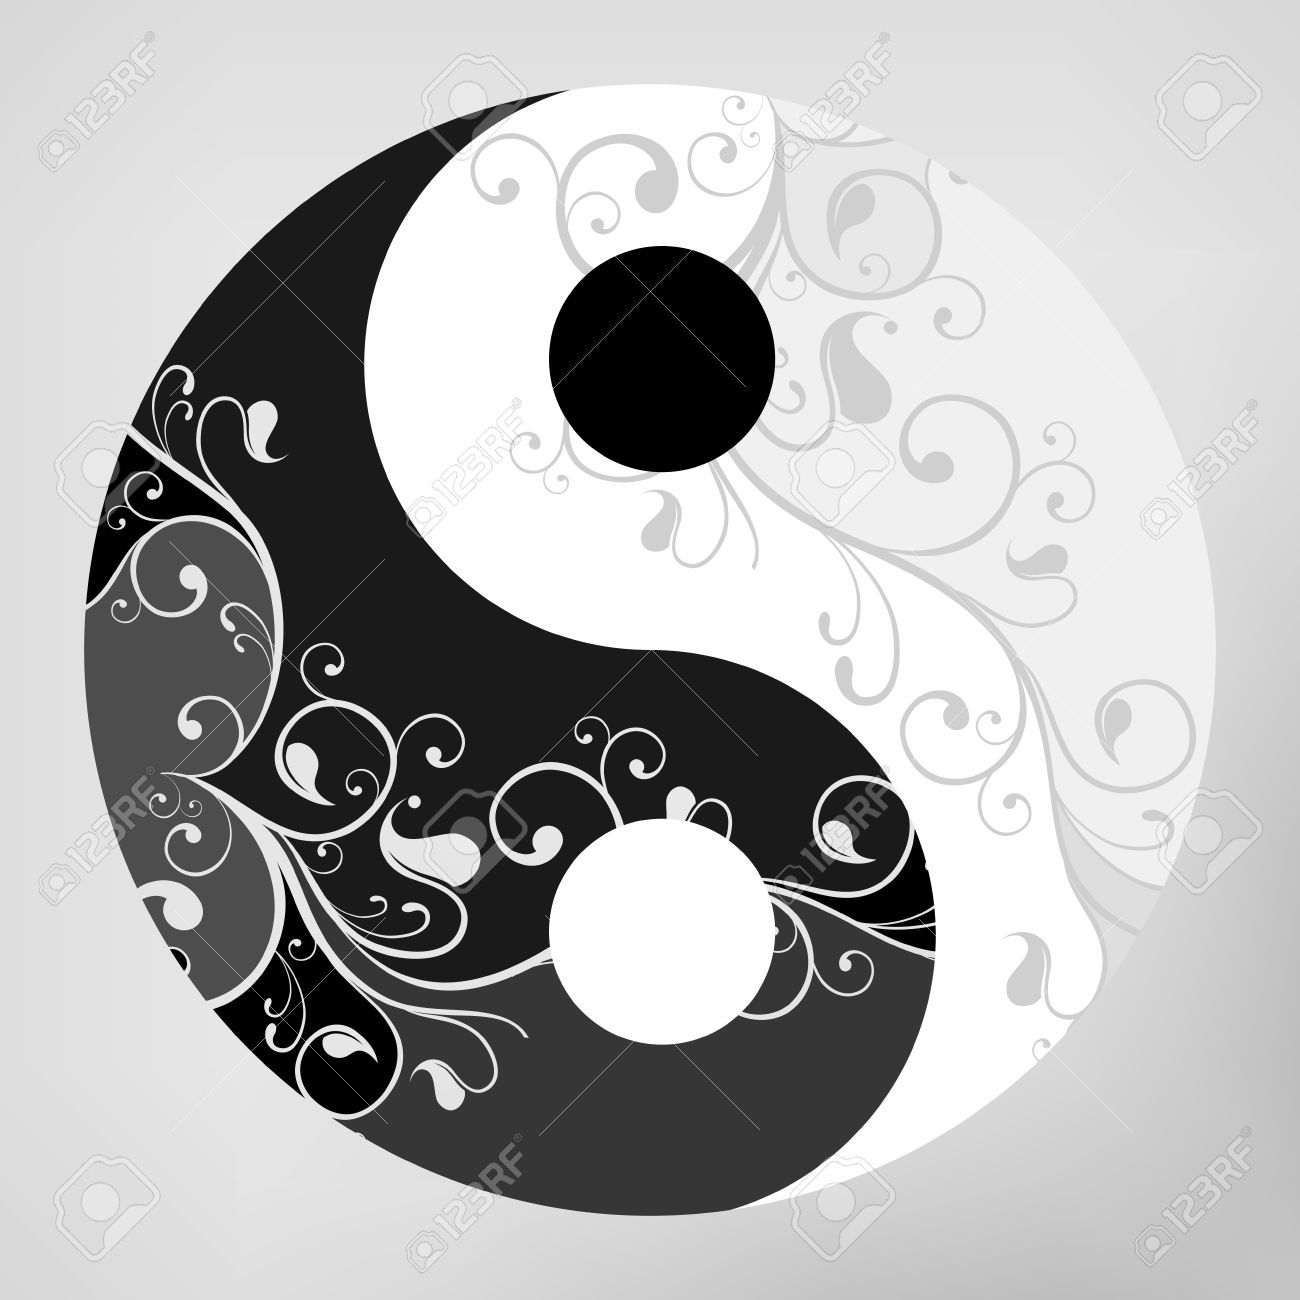 Ying yang symbol meaning images symbol and sign ideas 20862828 yin yang pattern symbol on grey background illustration yin yang yin yang pattern symbol on biocorpaavc